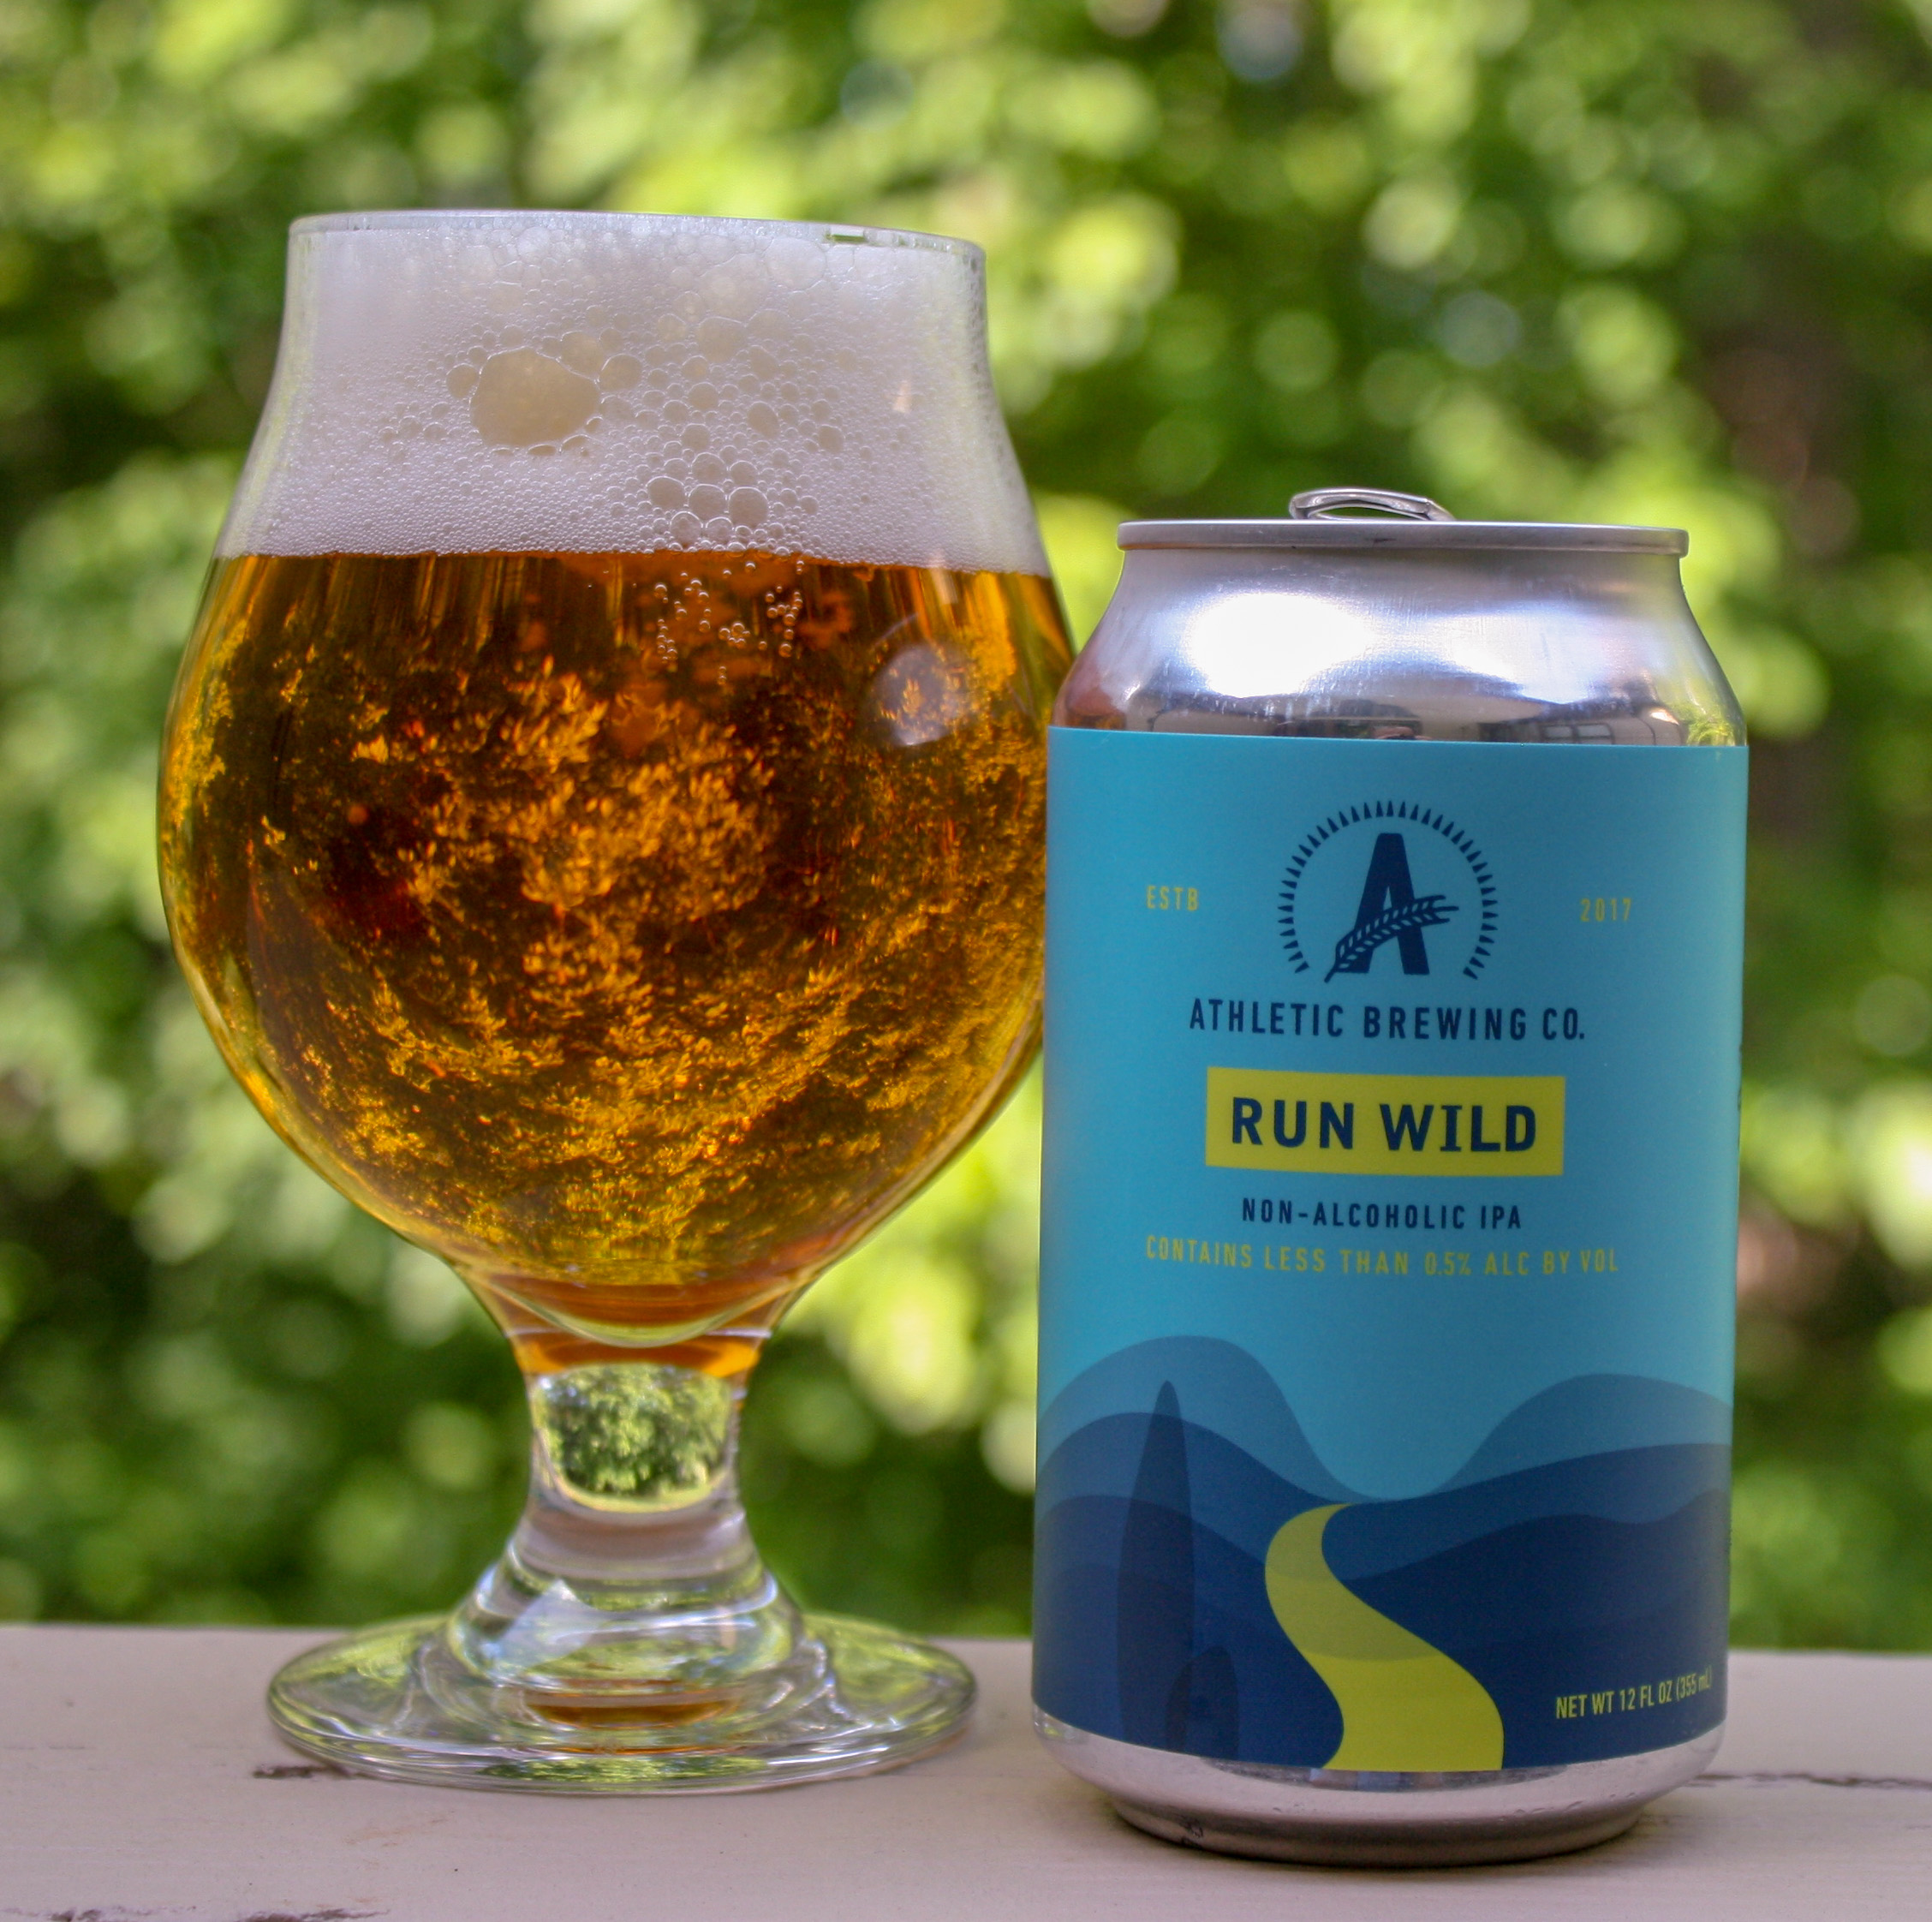 Athletic Brewing Runs Wild Non-Alcoholic IPA